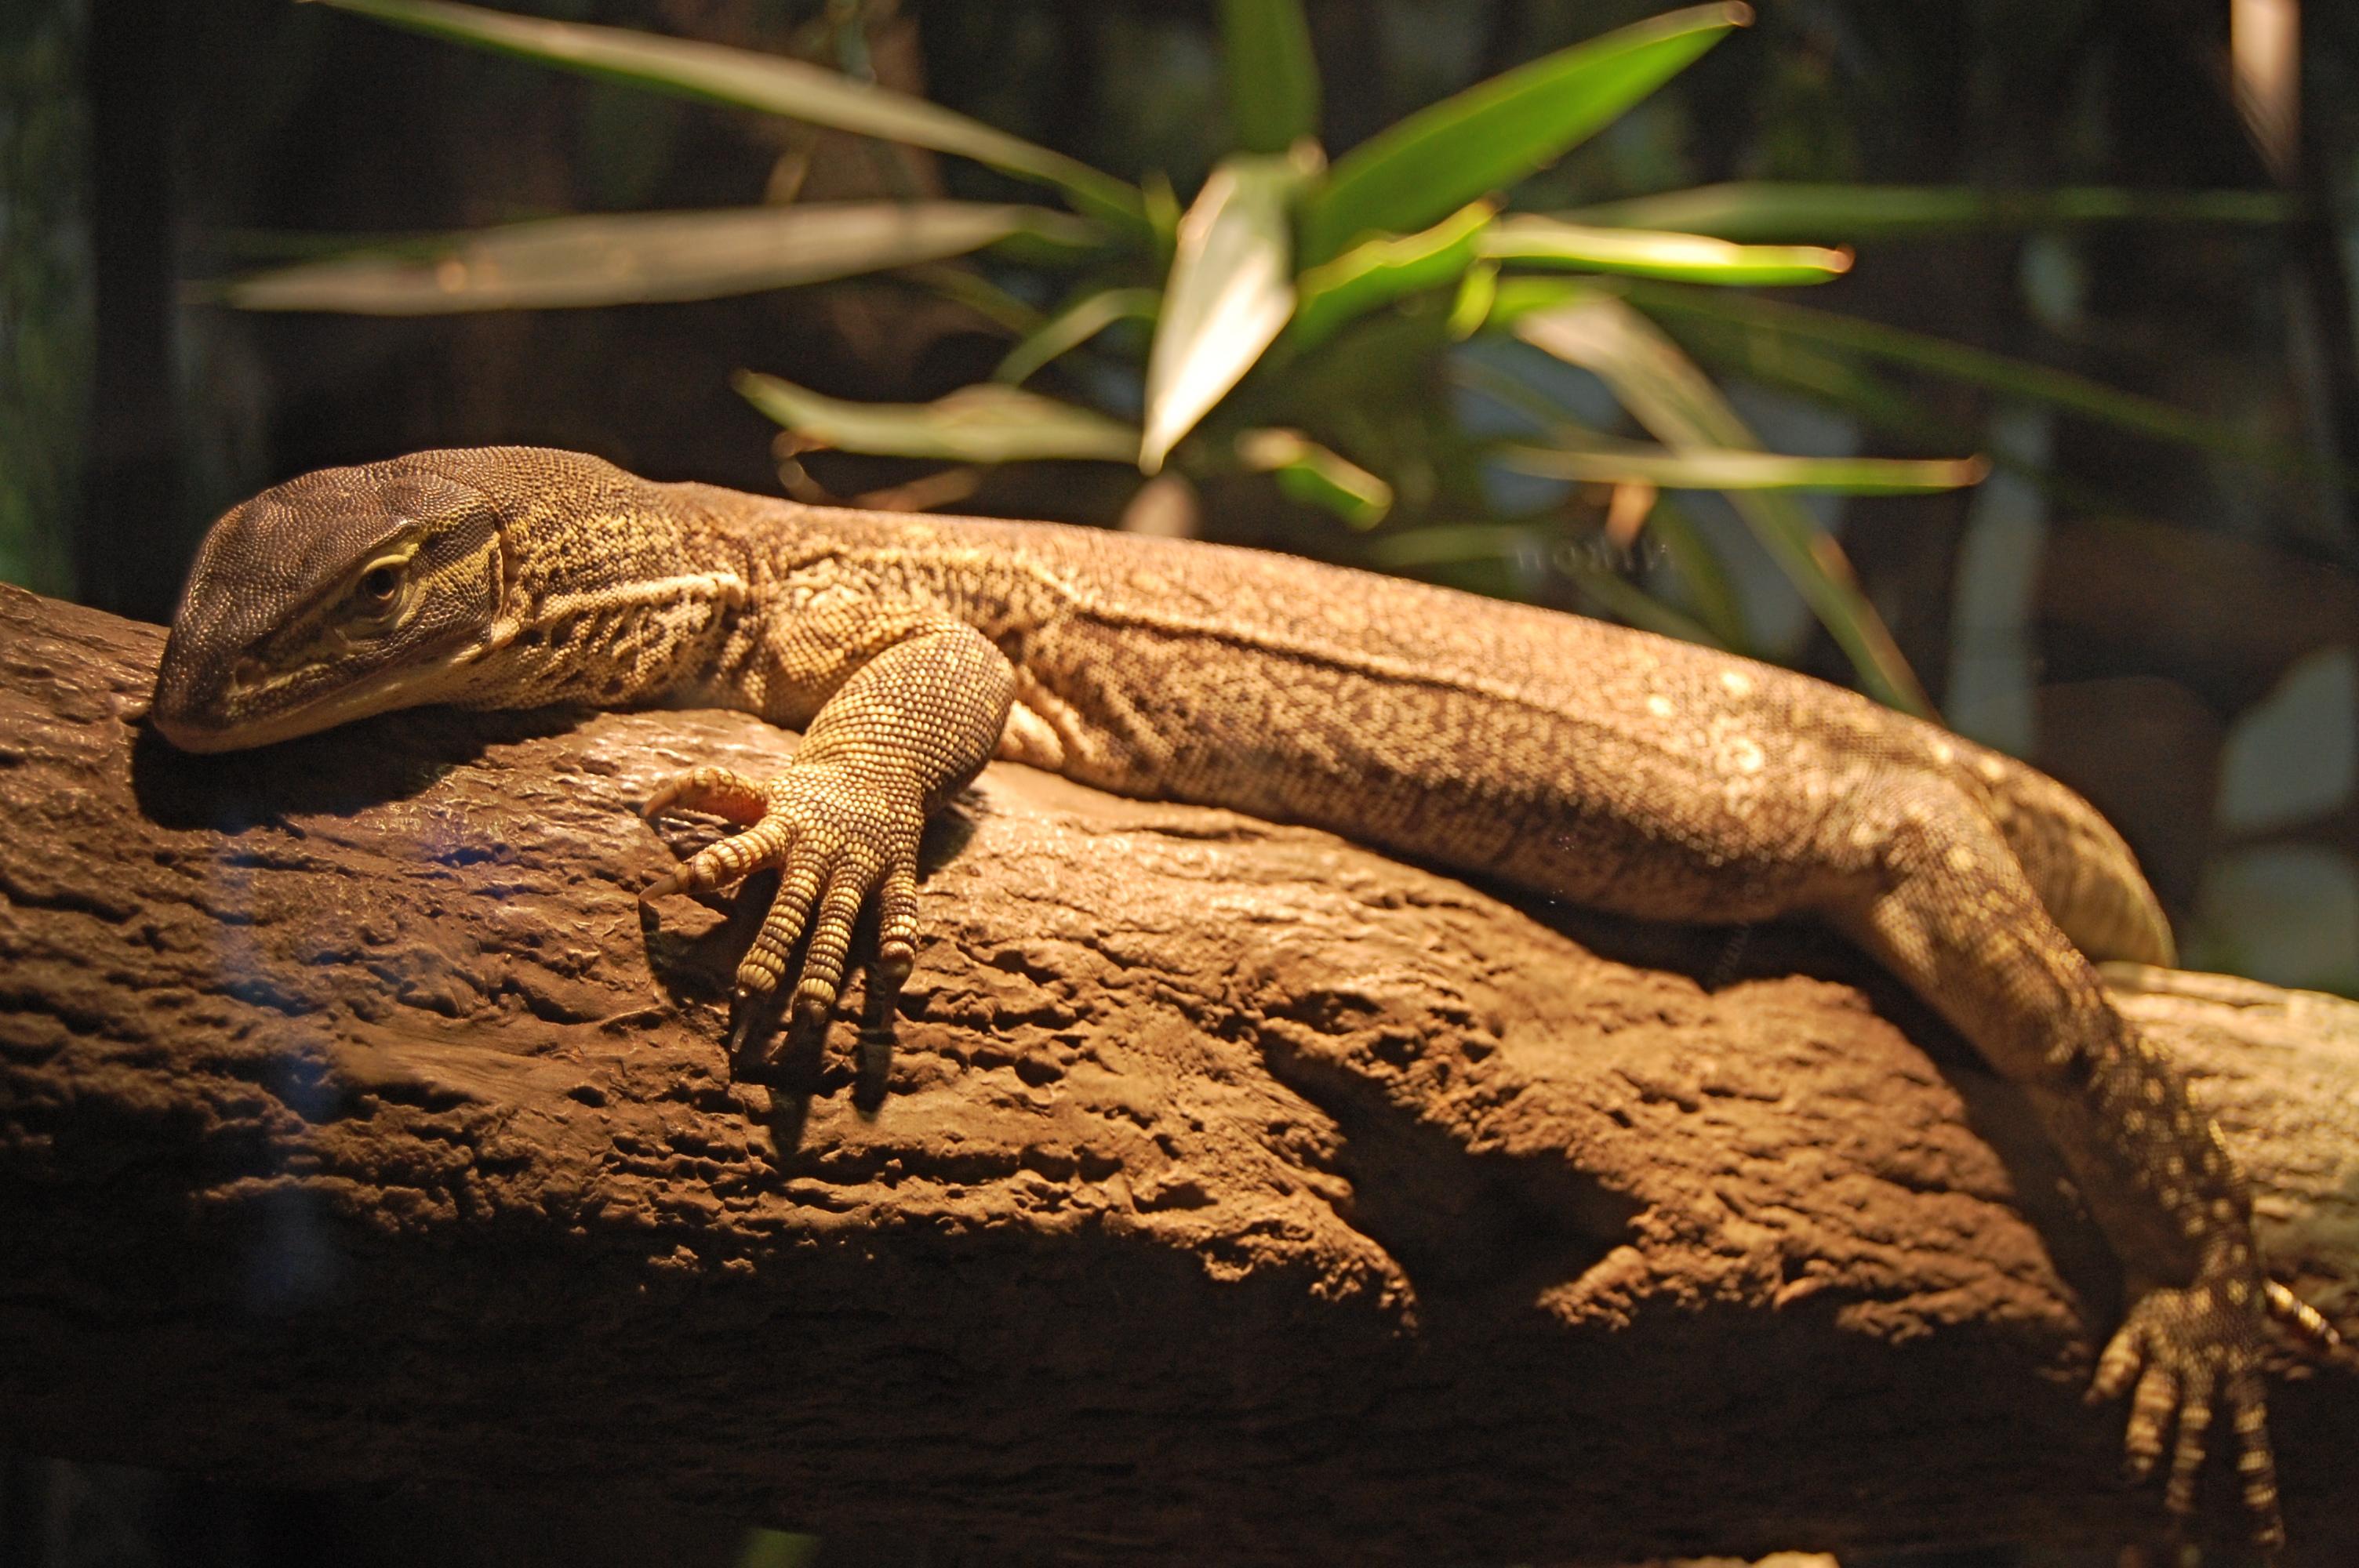 File:Argus monitor, Boston Aquarium.jpg - Wikipedia